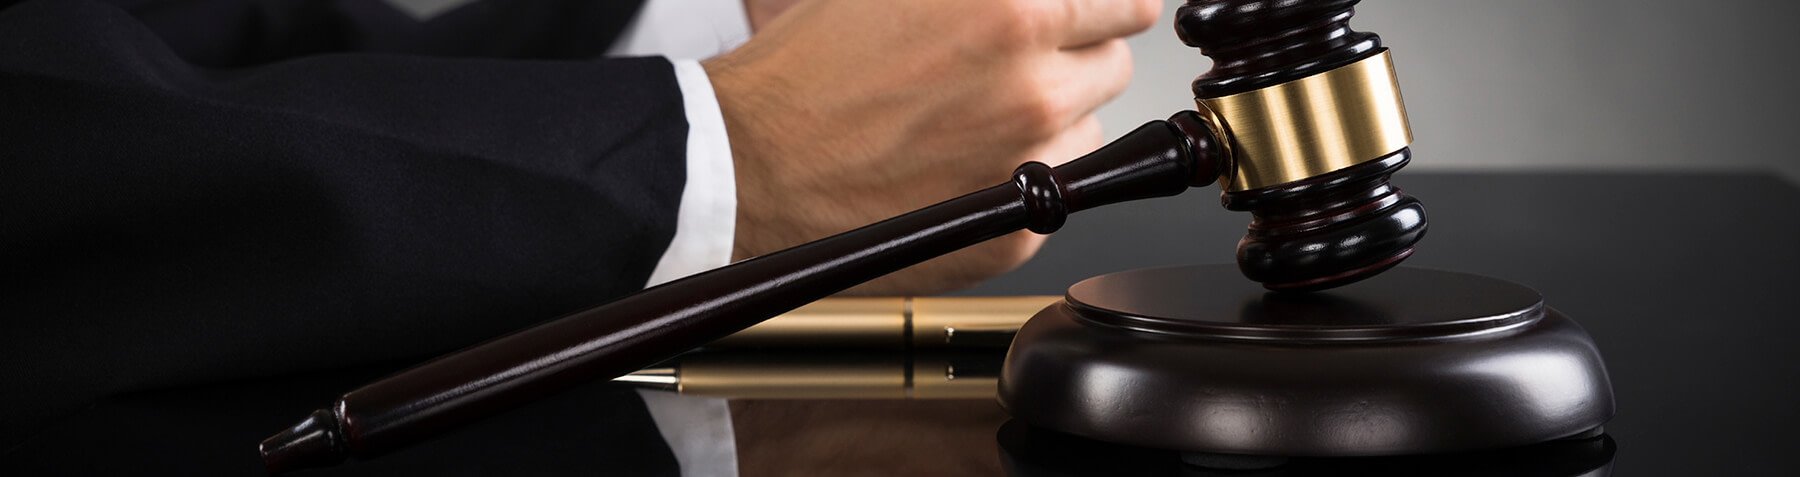 Employment tribunal representation